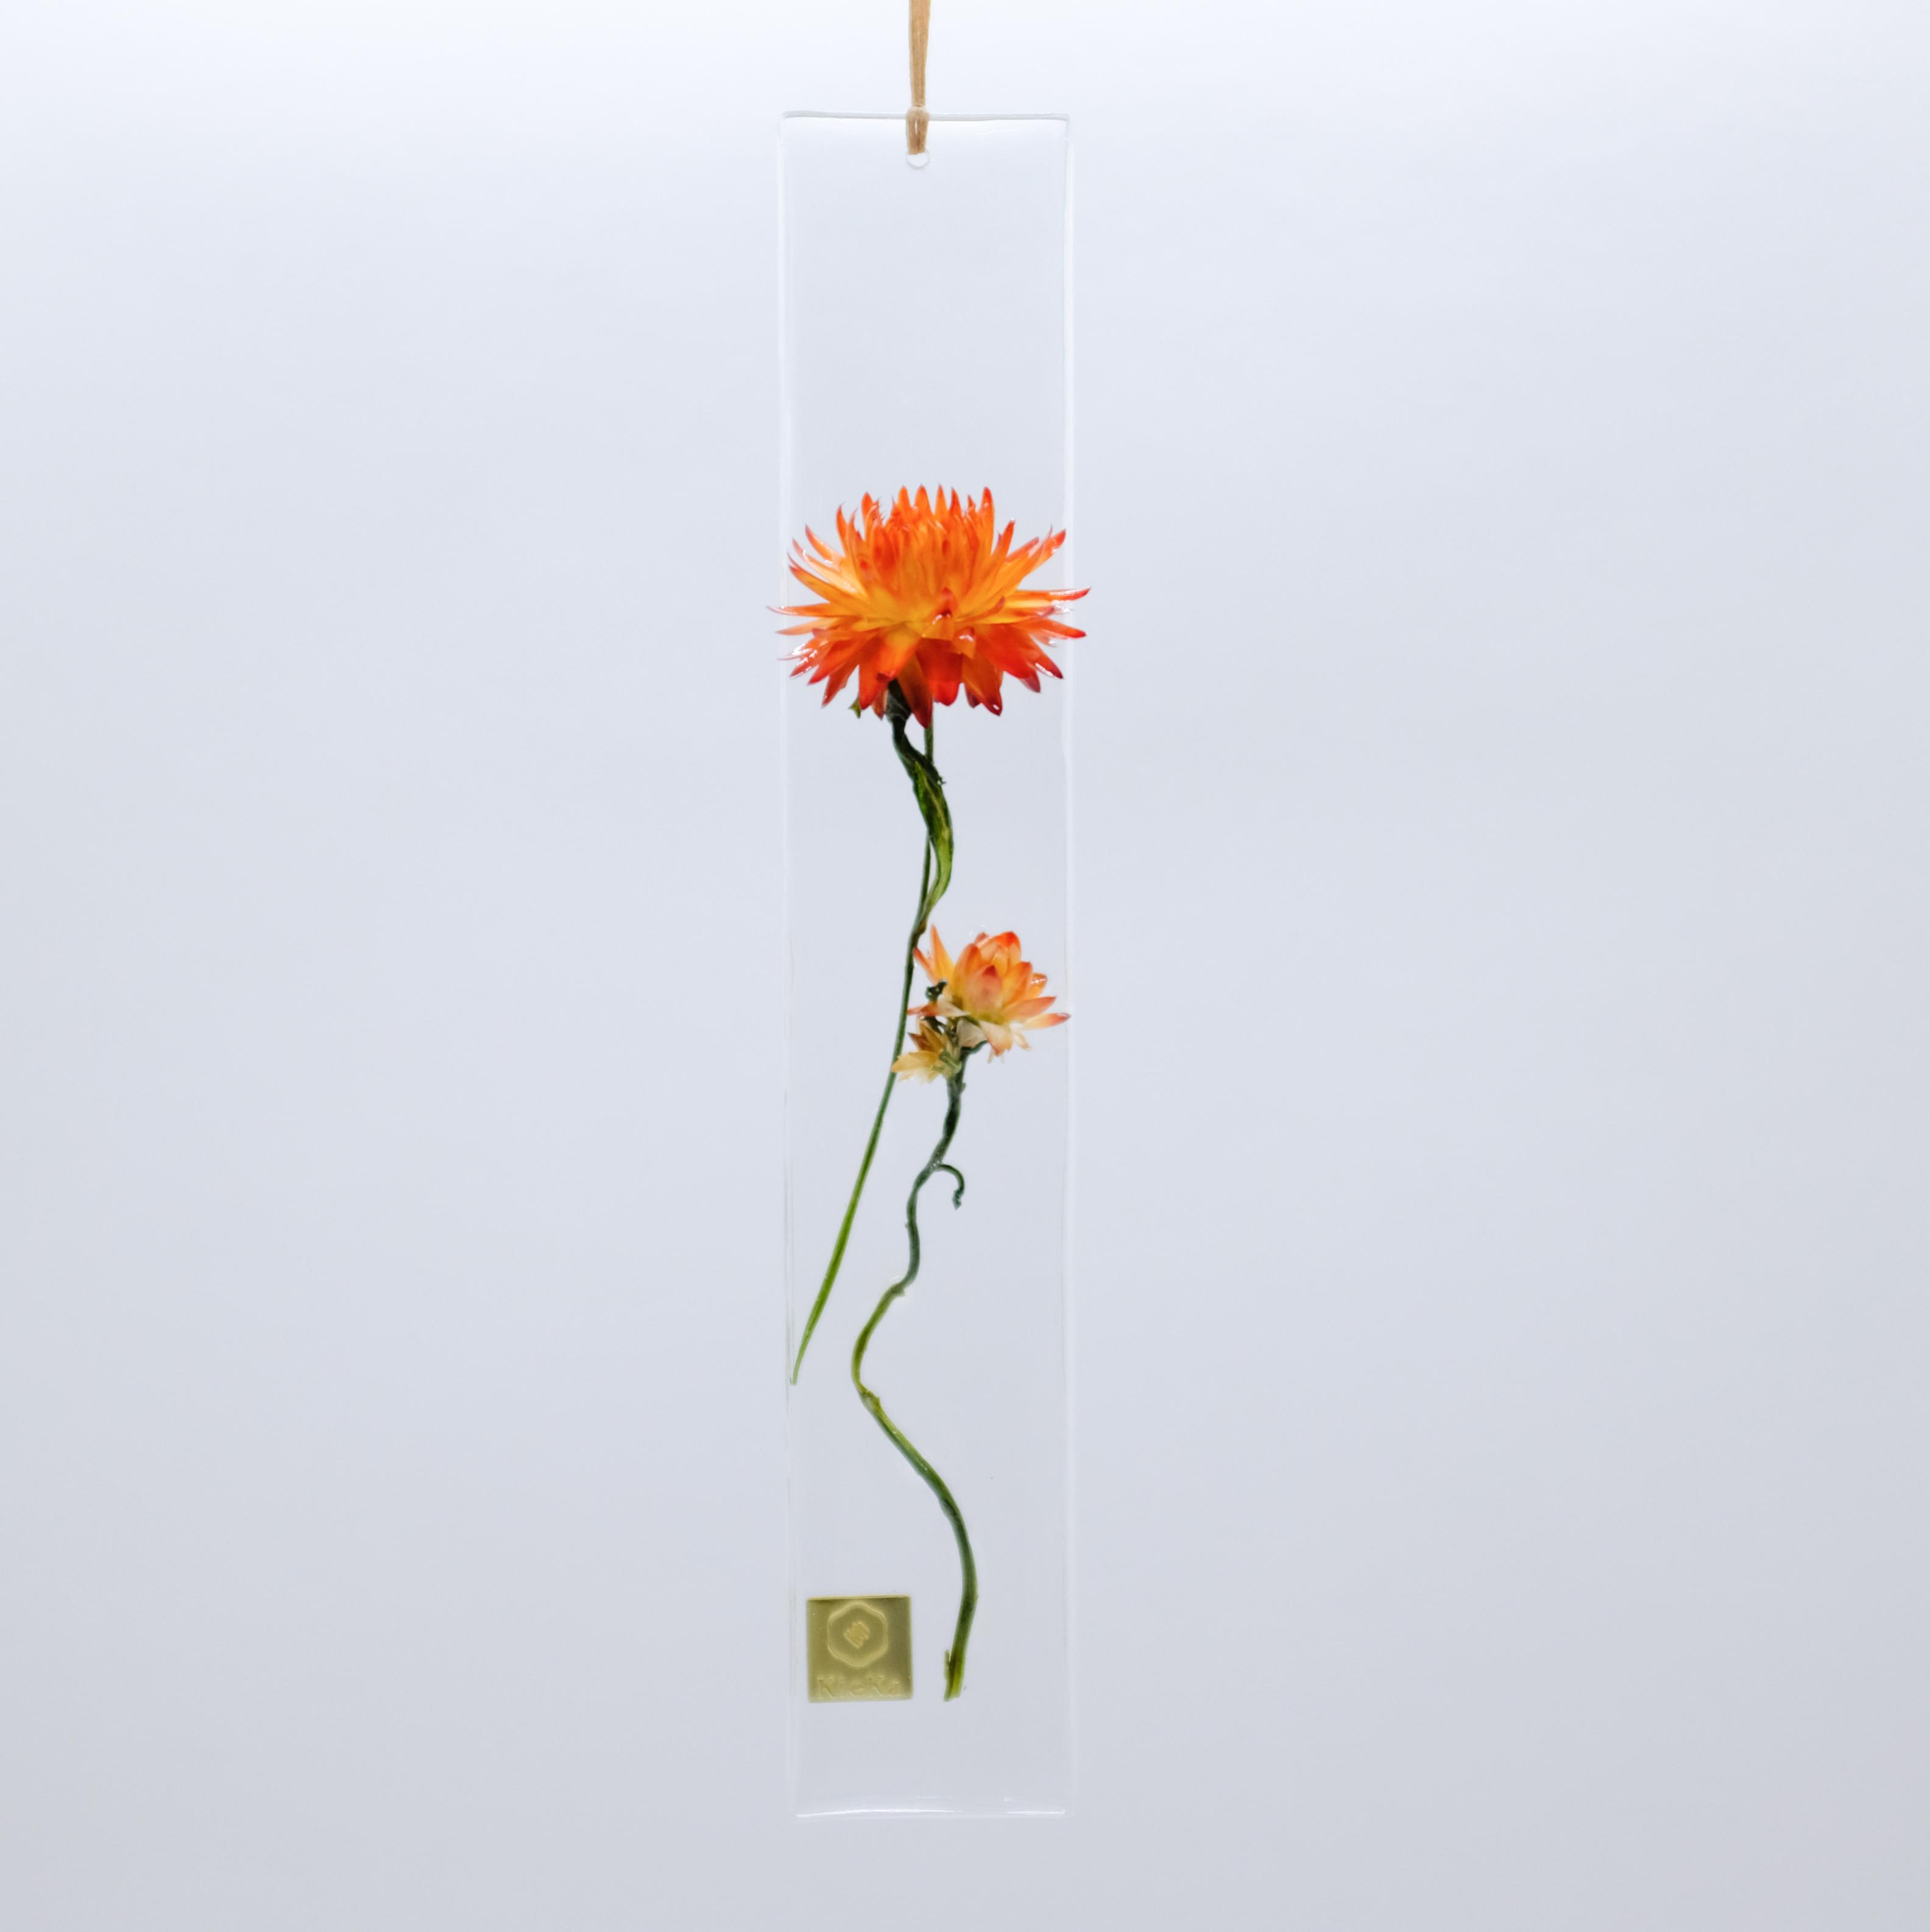 dried flower S ヘリクリサム オレンジ系